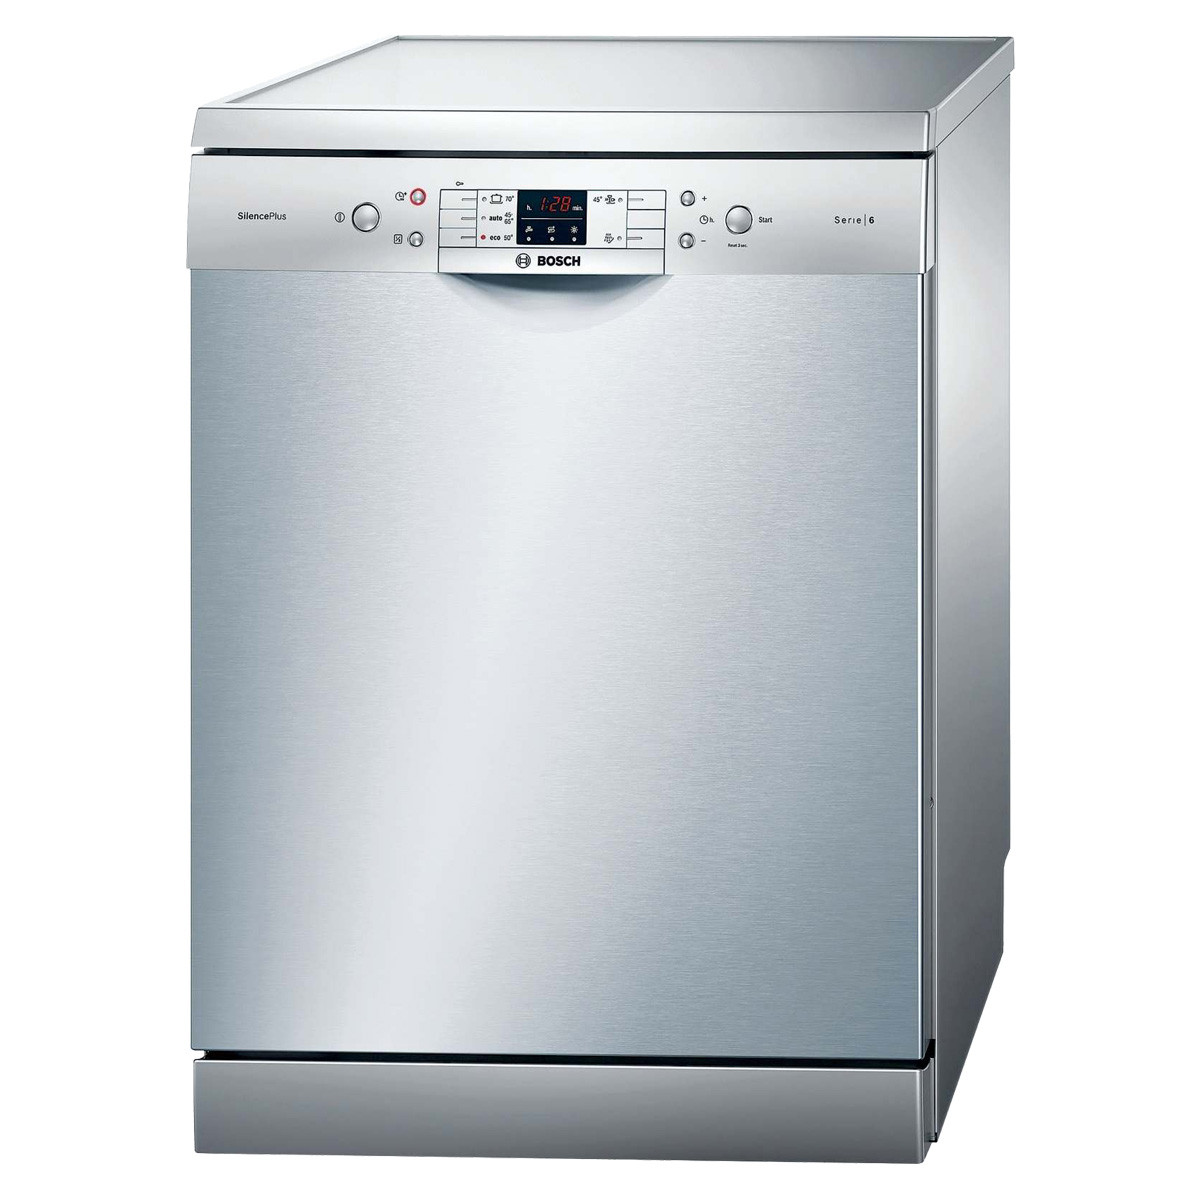 تصویر ماشین ظرفشویی بوش مدل SMS58M08IR سری 6 Bosch Dishwasher 13 Place Series 6 SMS58M08IR